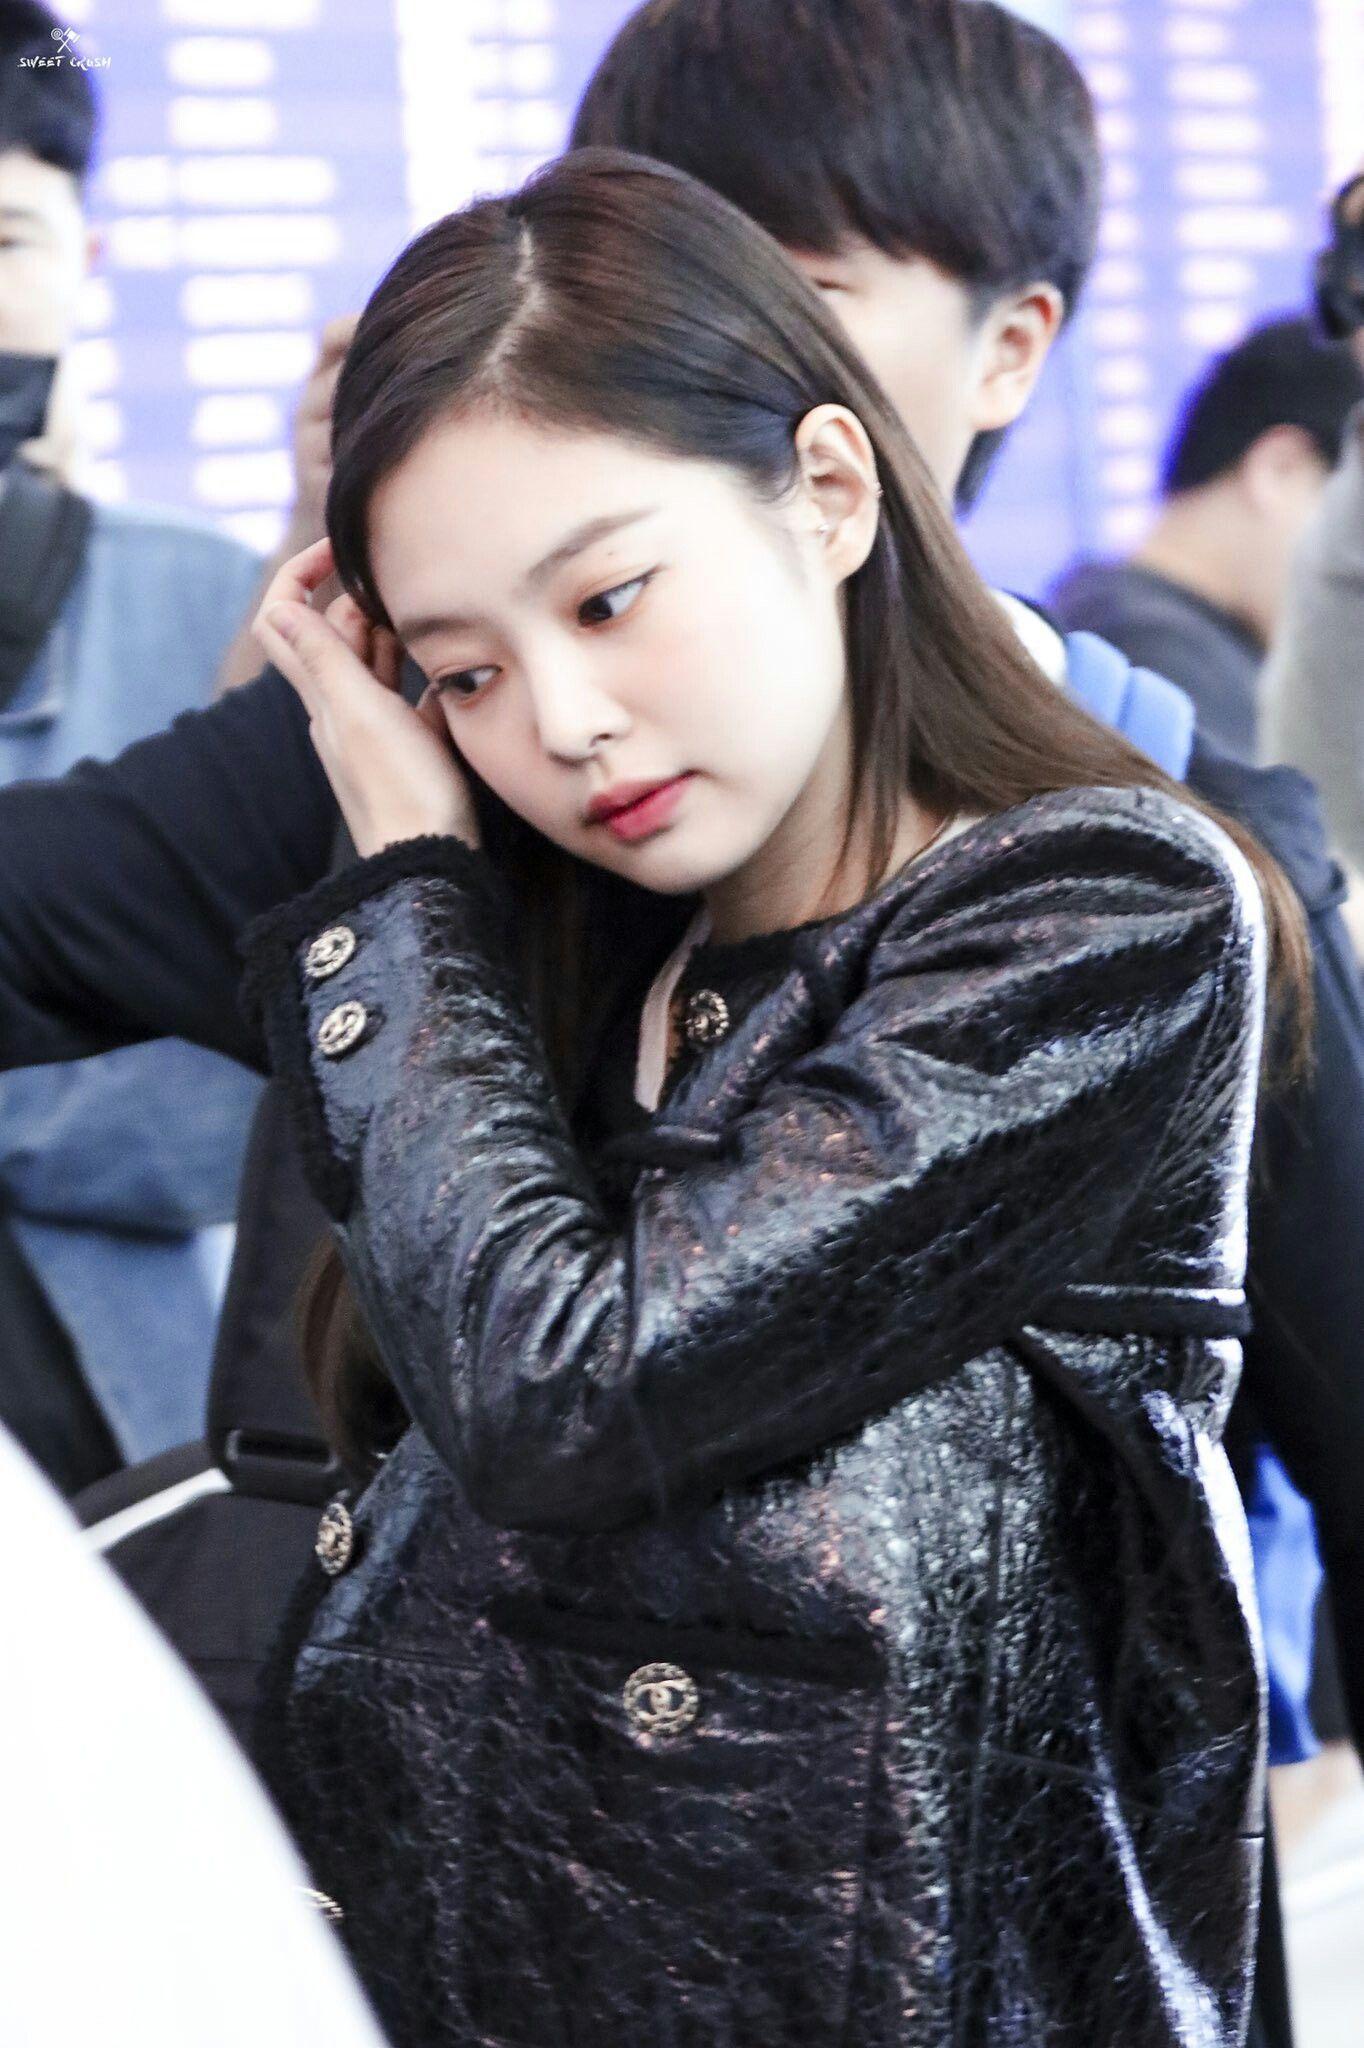 Pin By Puffy On Jennie Blackpink Jennie Female Singers Asian Beauty